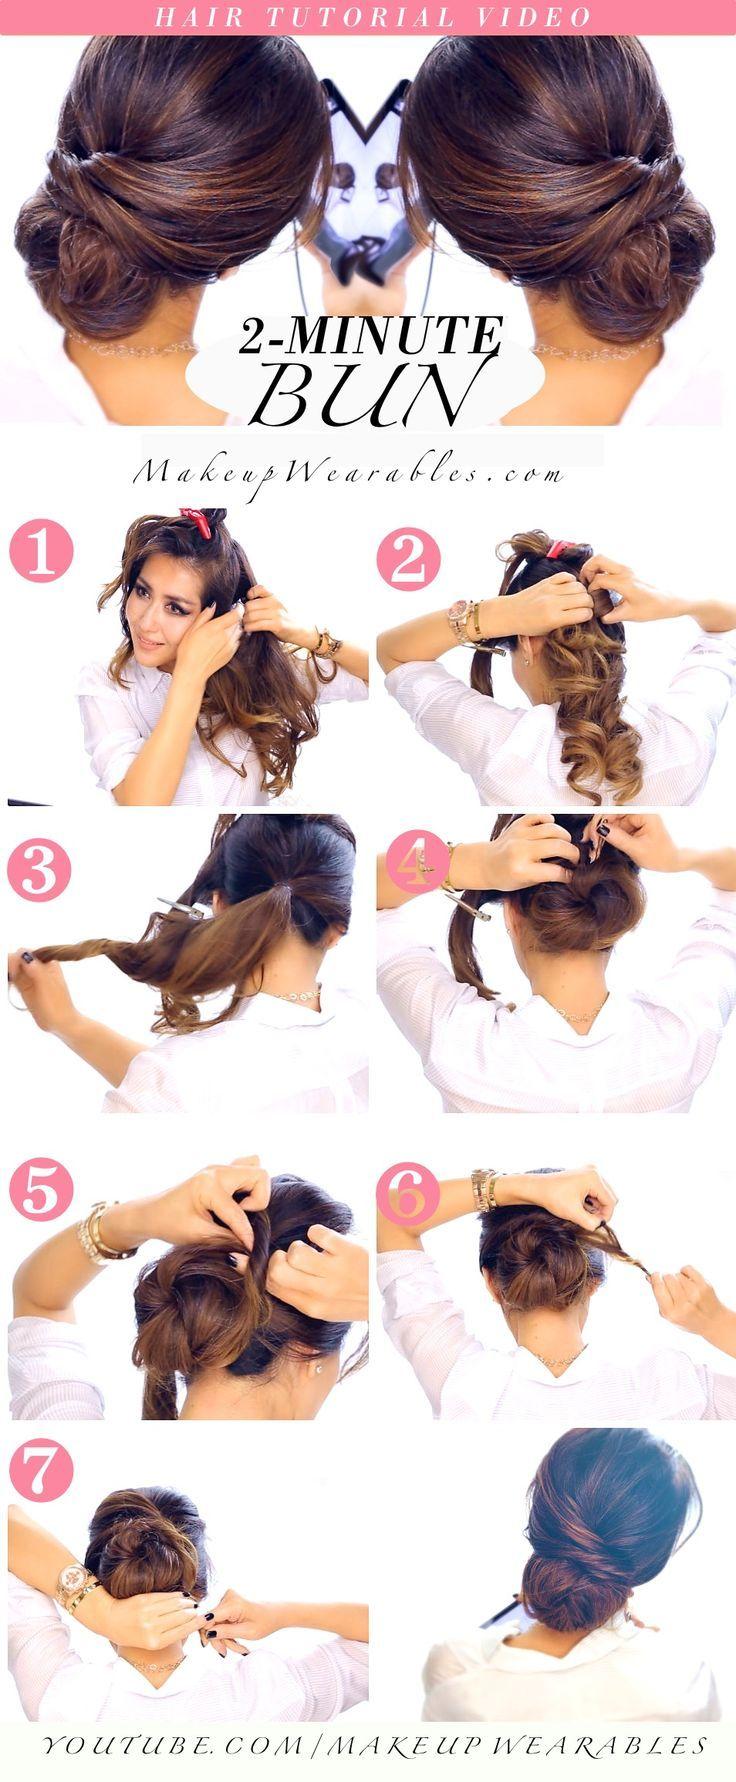 Easy diy hairstyle tutorials makeupwearables hairstyles pinterest